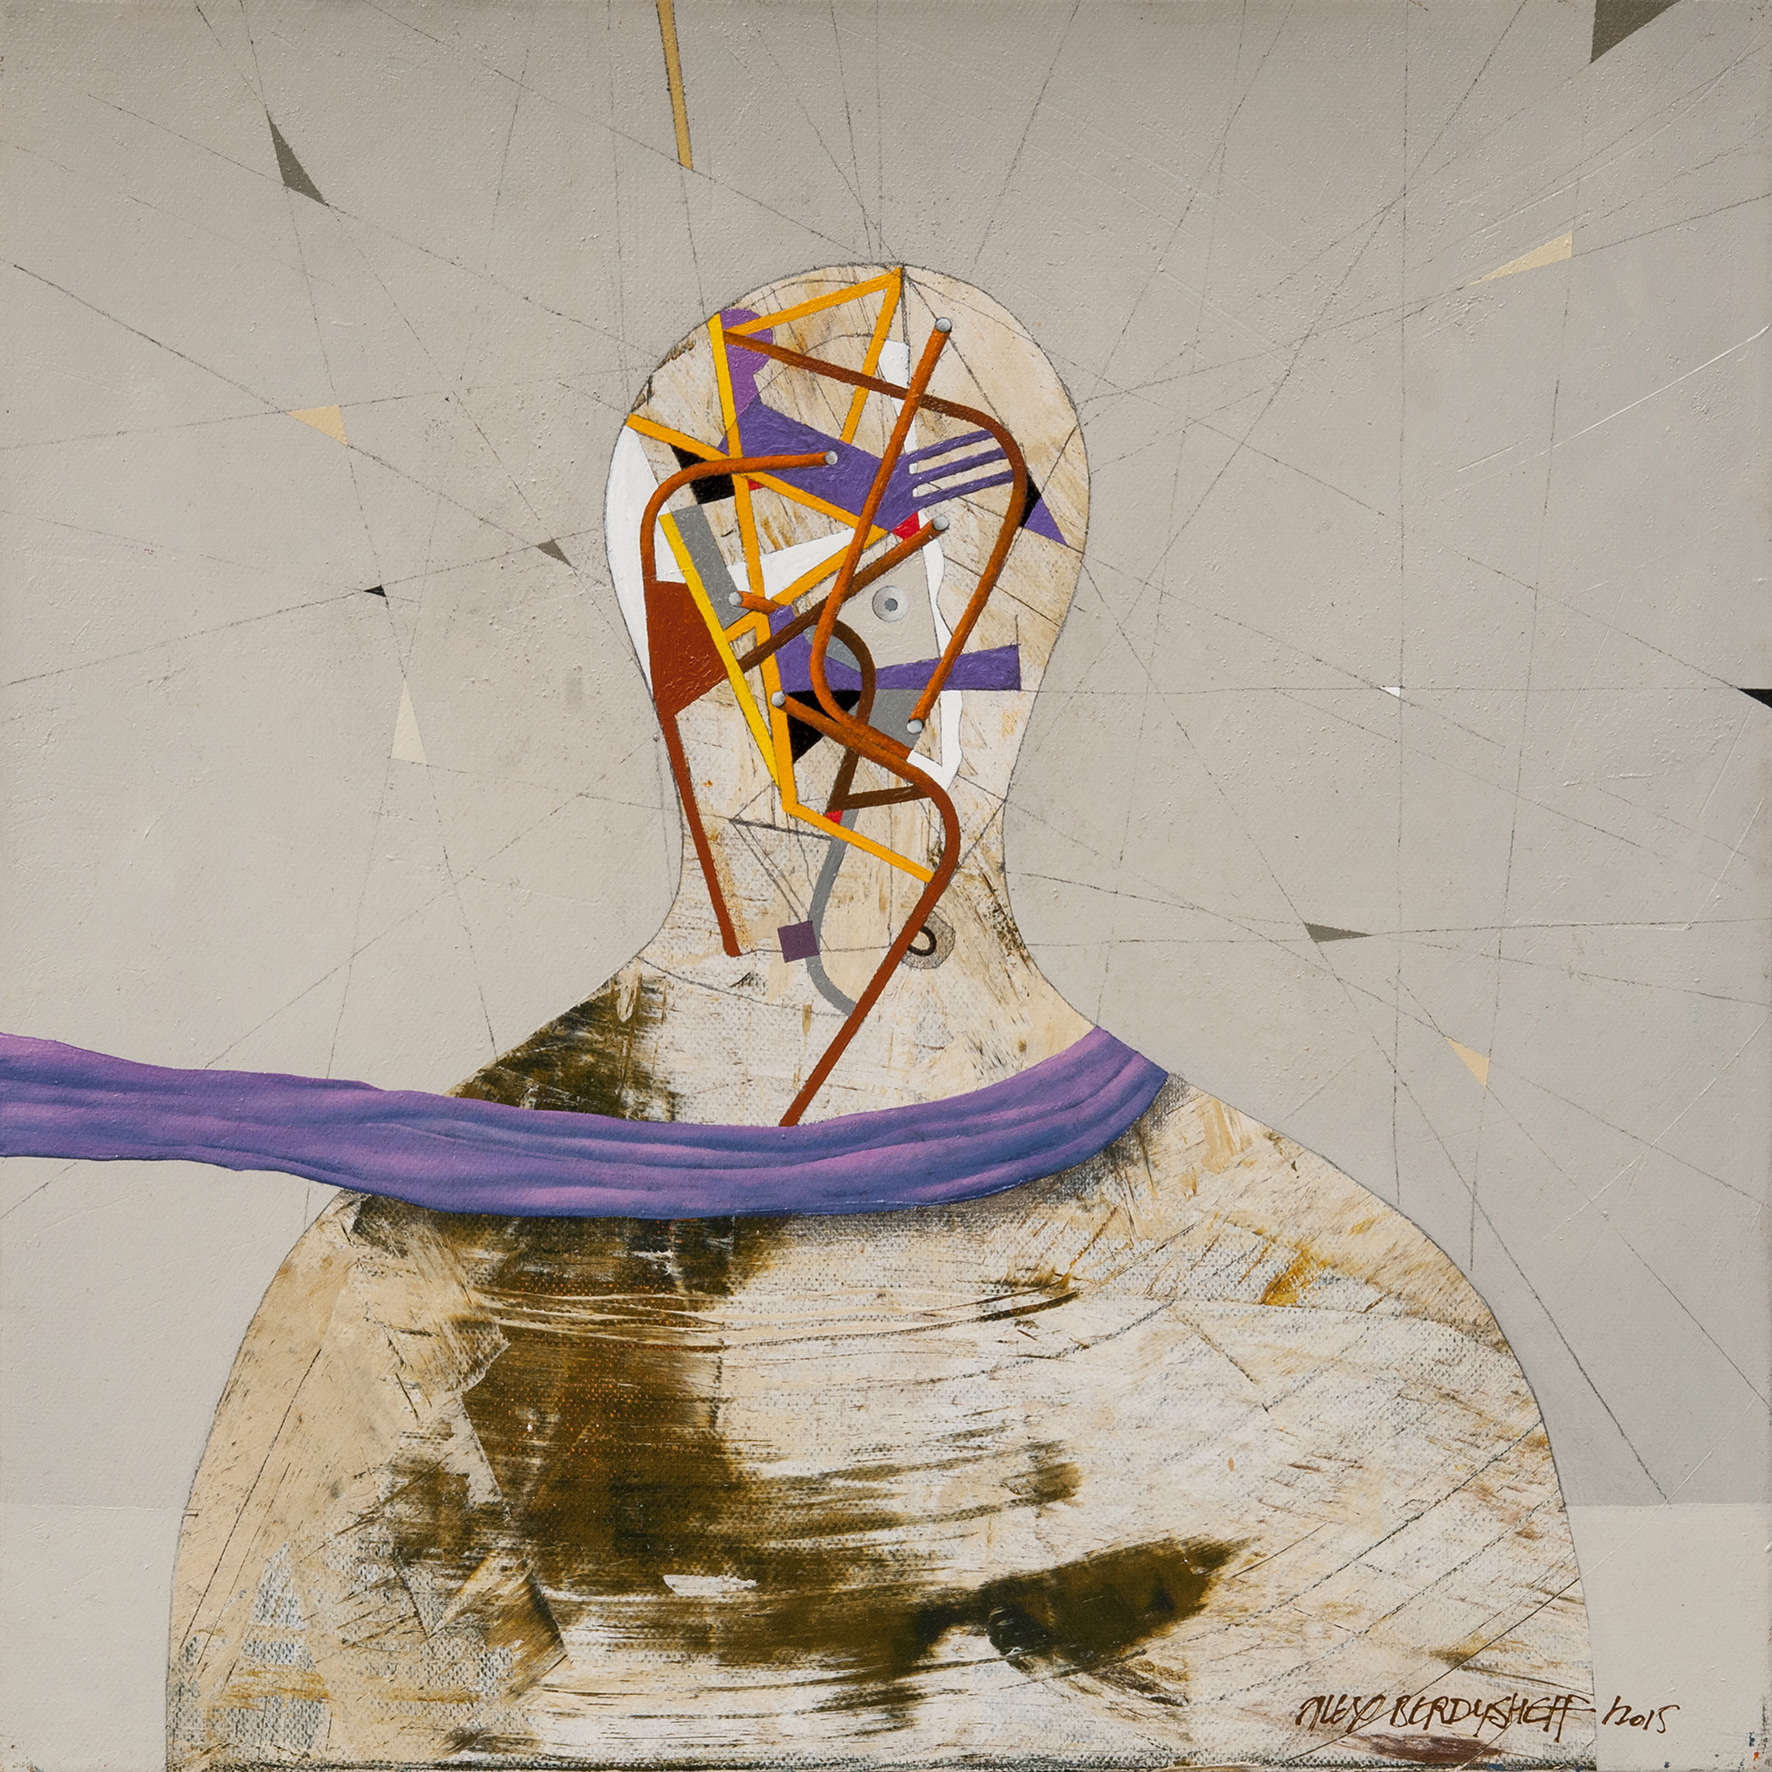 Lilac Scarf, oil on canvas, 46x46 cm, 2015